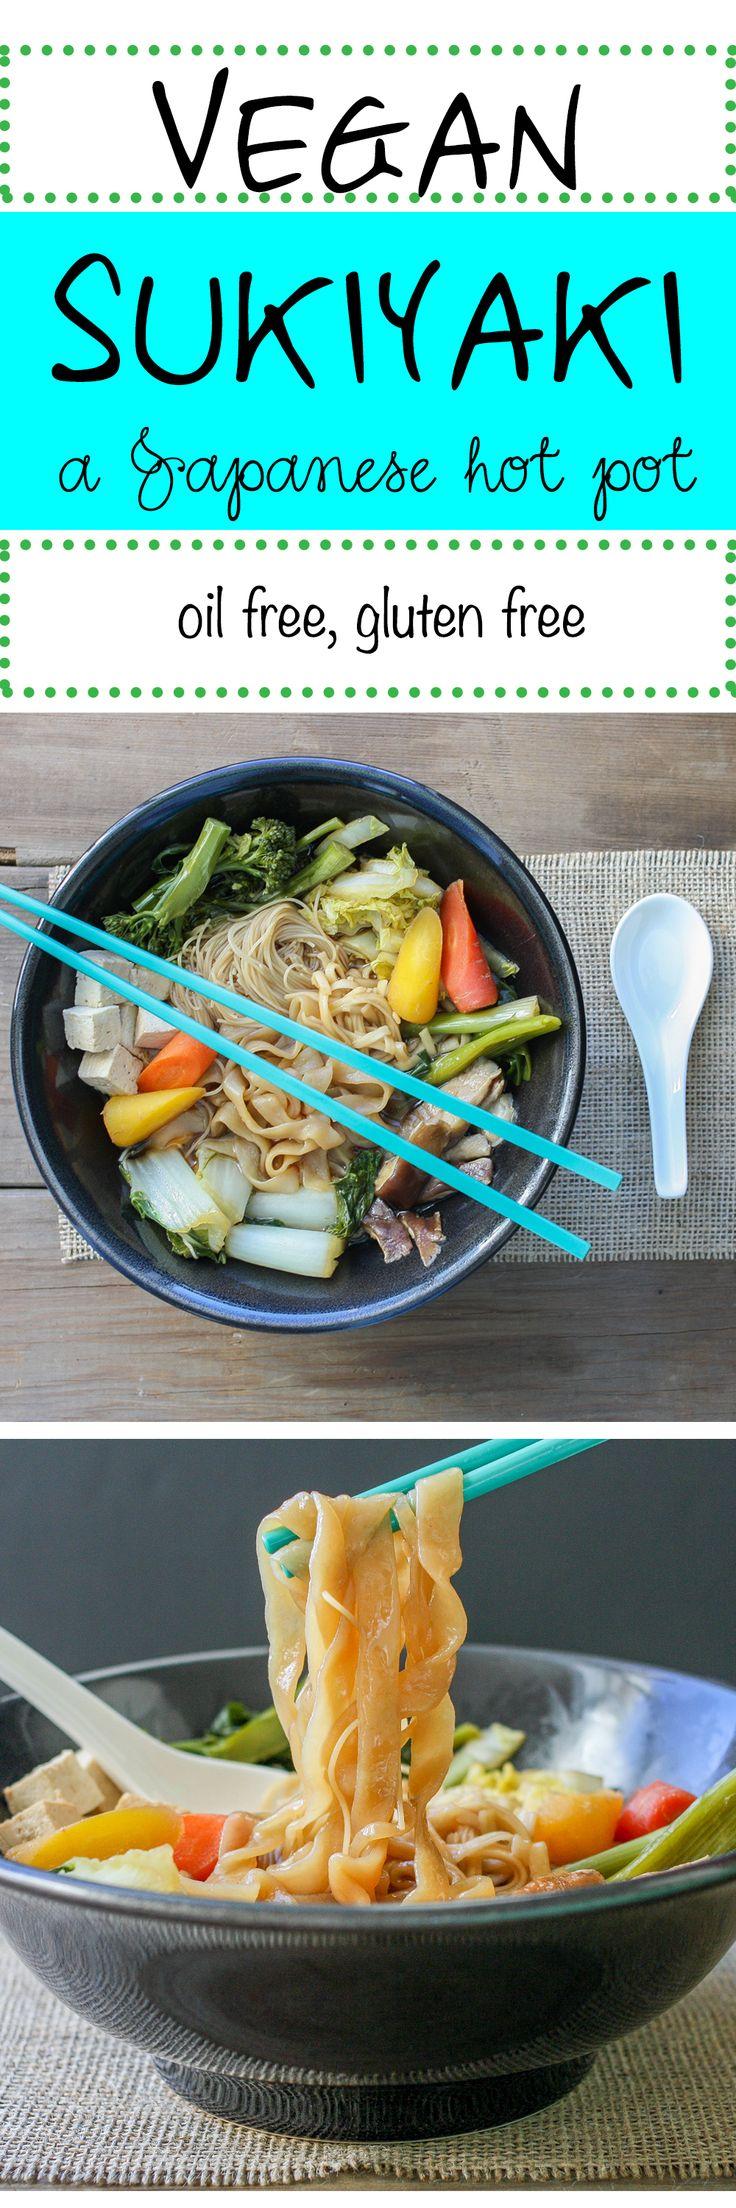 Sukiyaki Japanese hot pot dish | www.veggiesdontbite.com | #vegan #plantbased #glutenfree